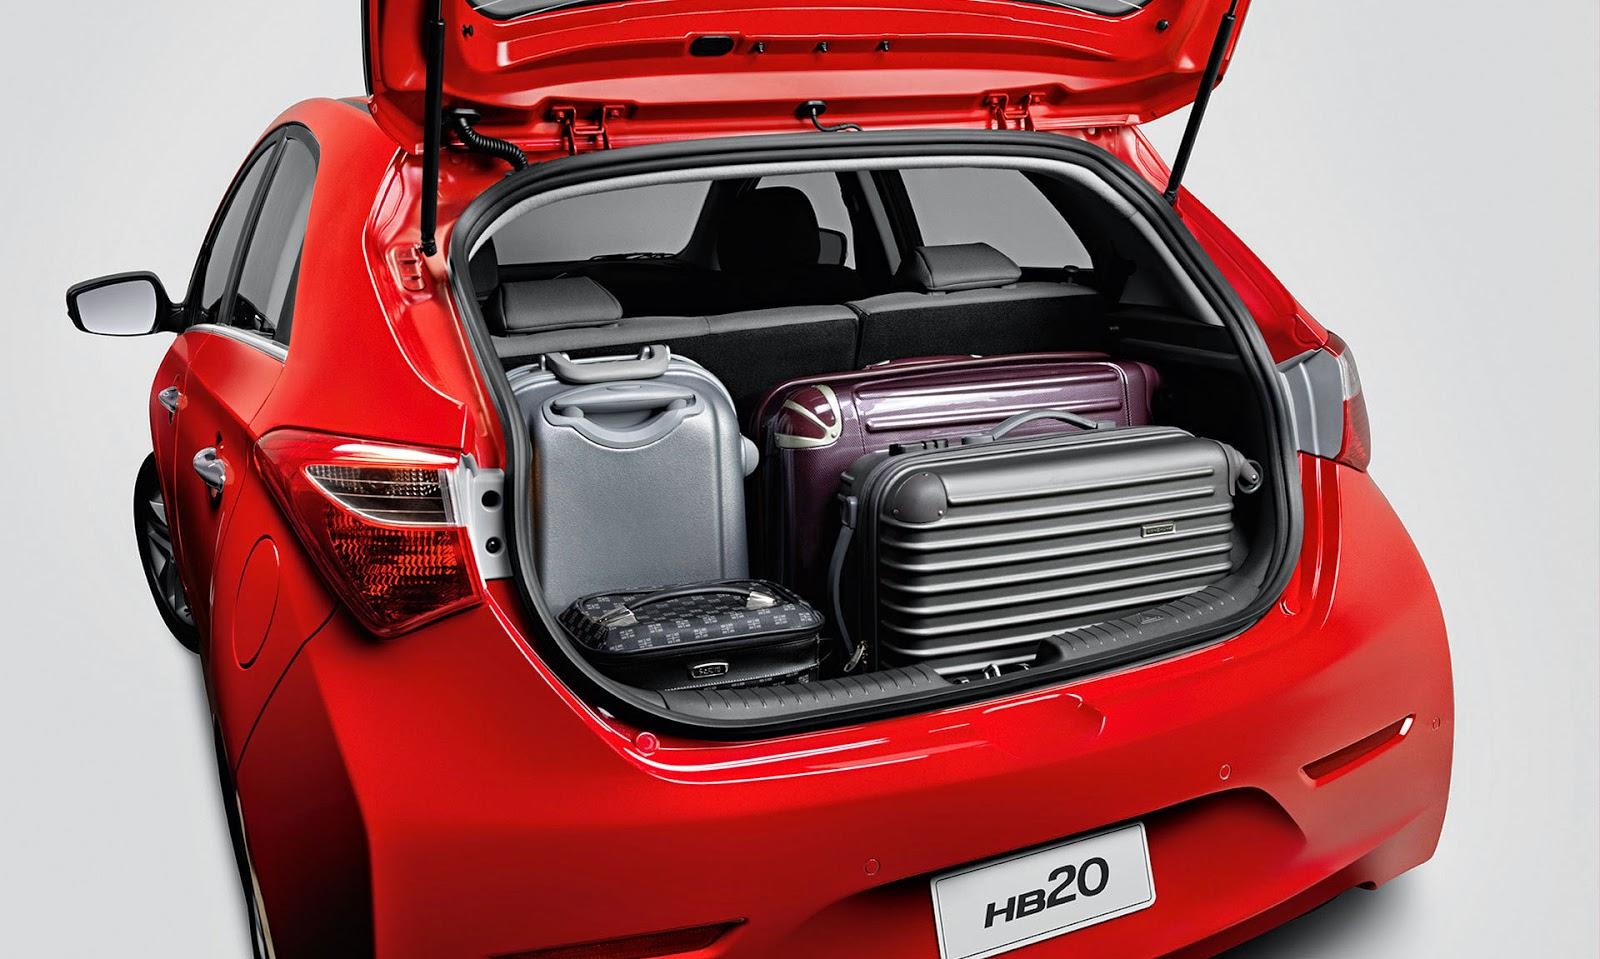 Hyundai Hb20 hatch 2015